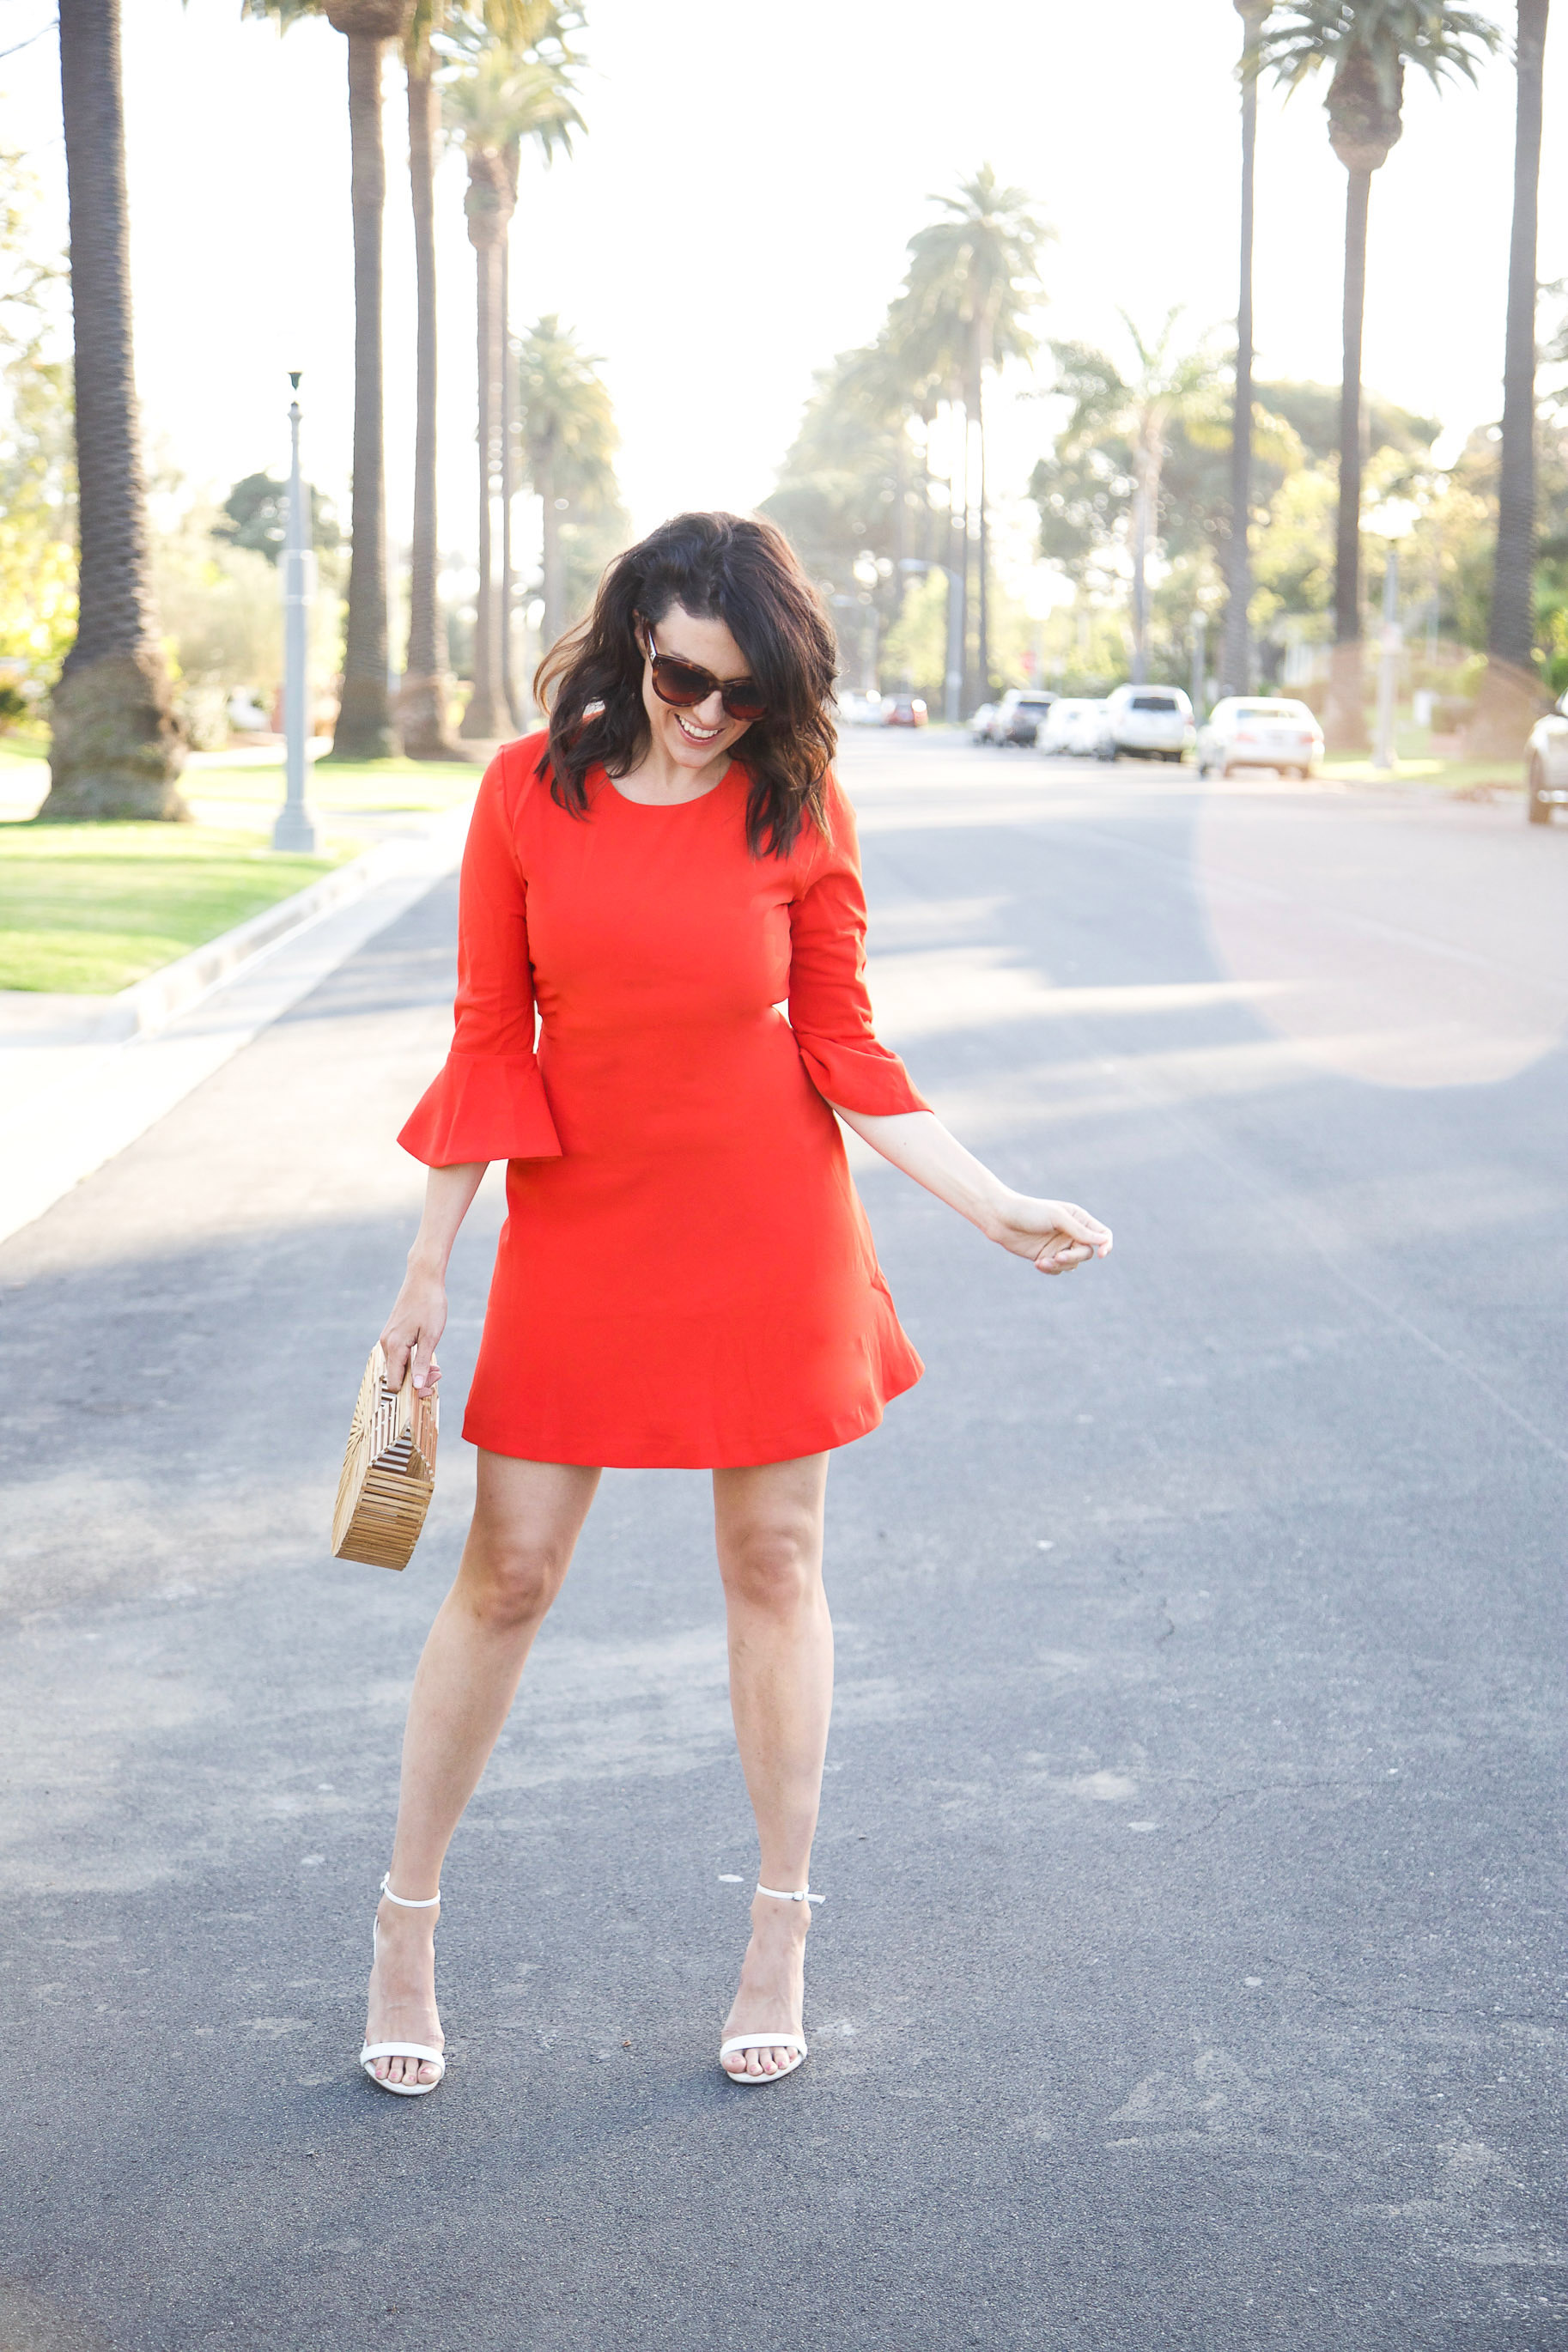 Lucy-Paris-Red-Bell-Sleeved-Dress1.jpg